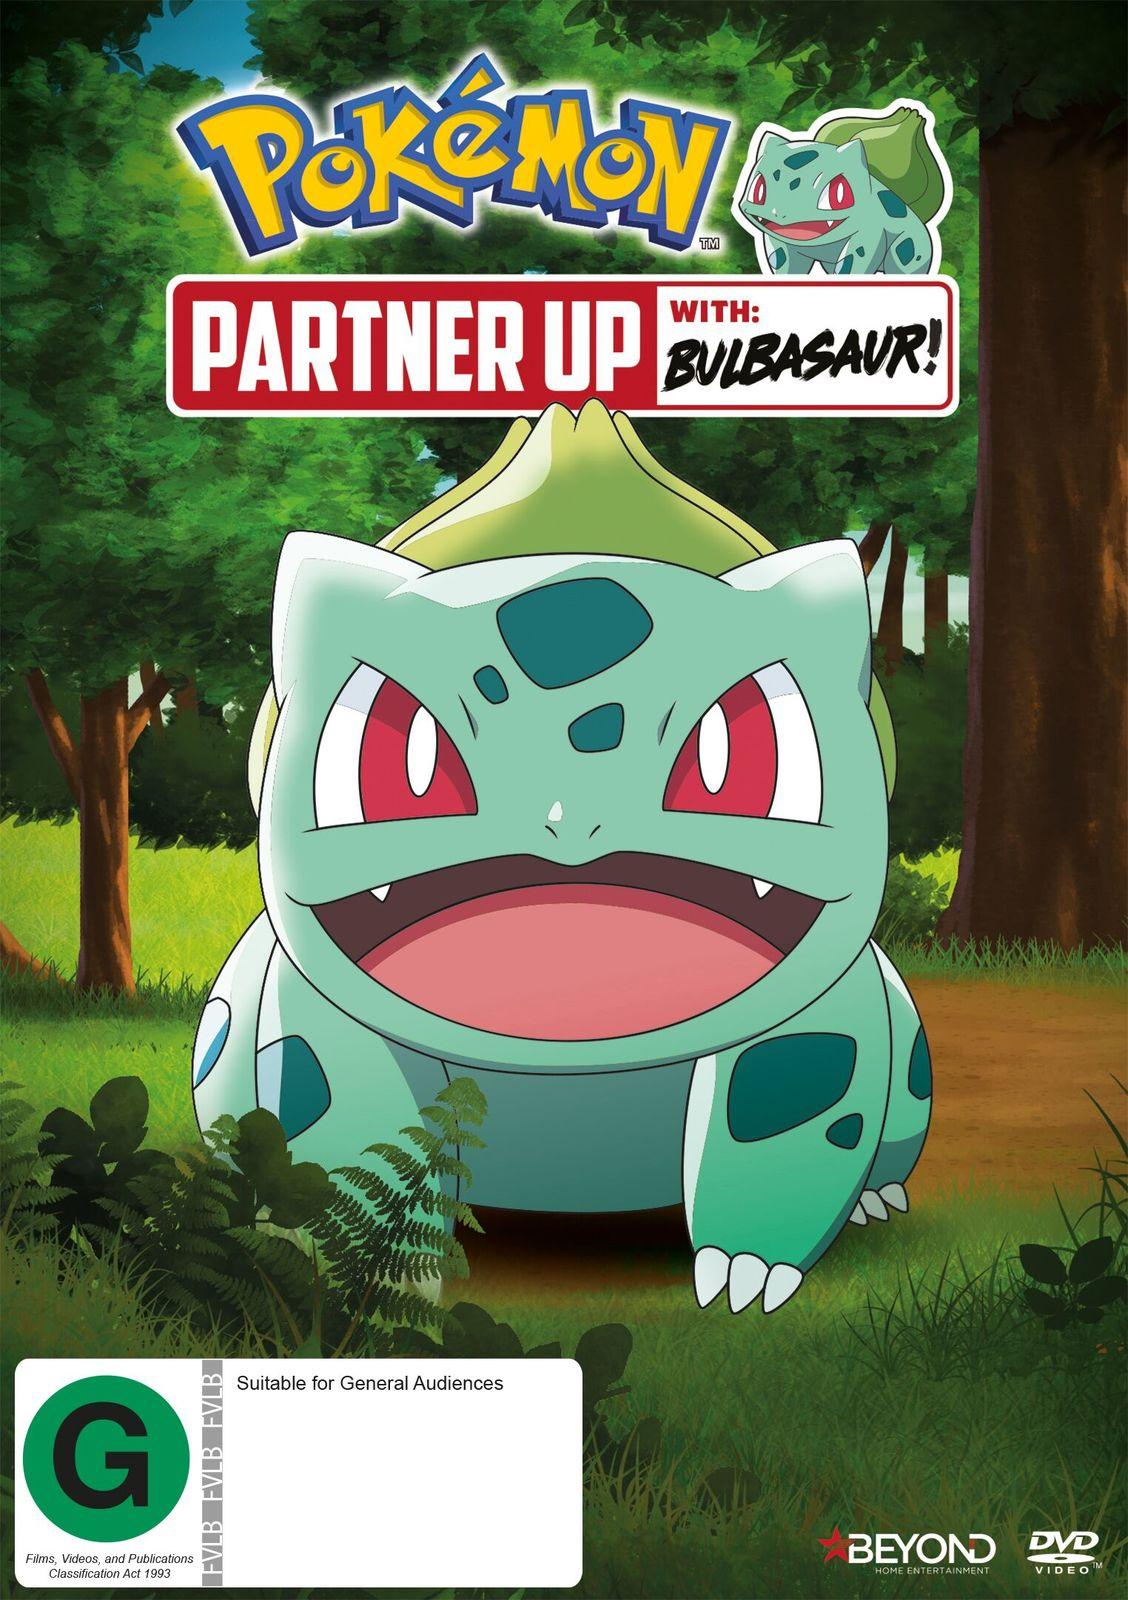 Pokemon: Partner Up With Bulbasaur! on DVD image